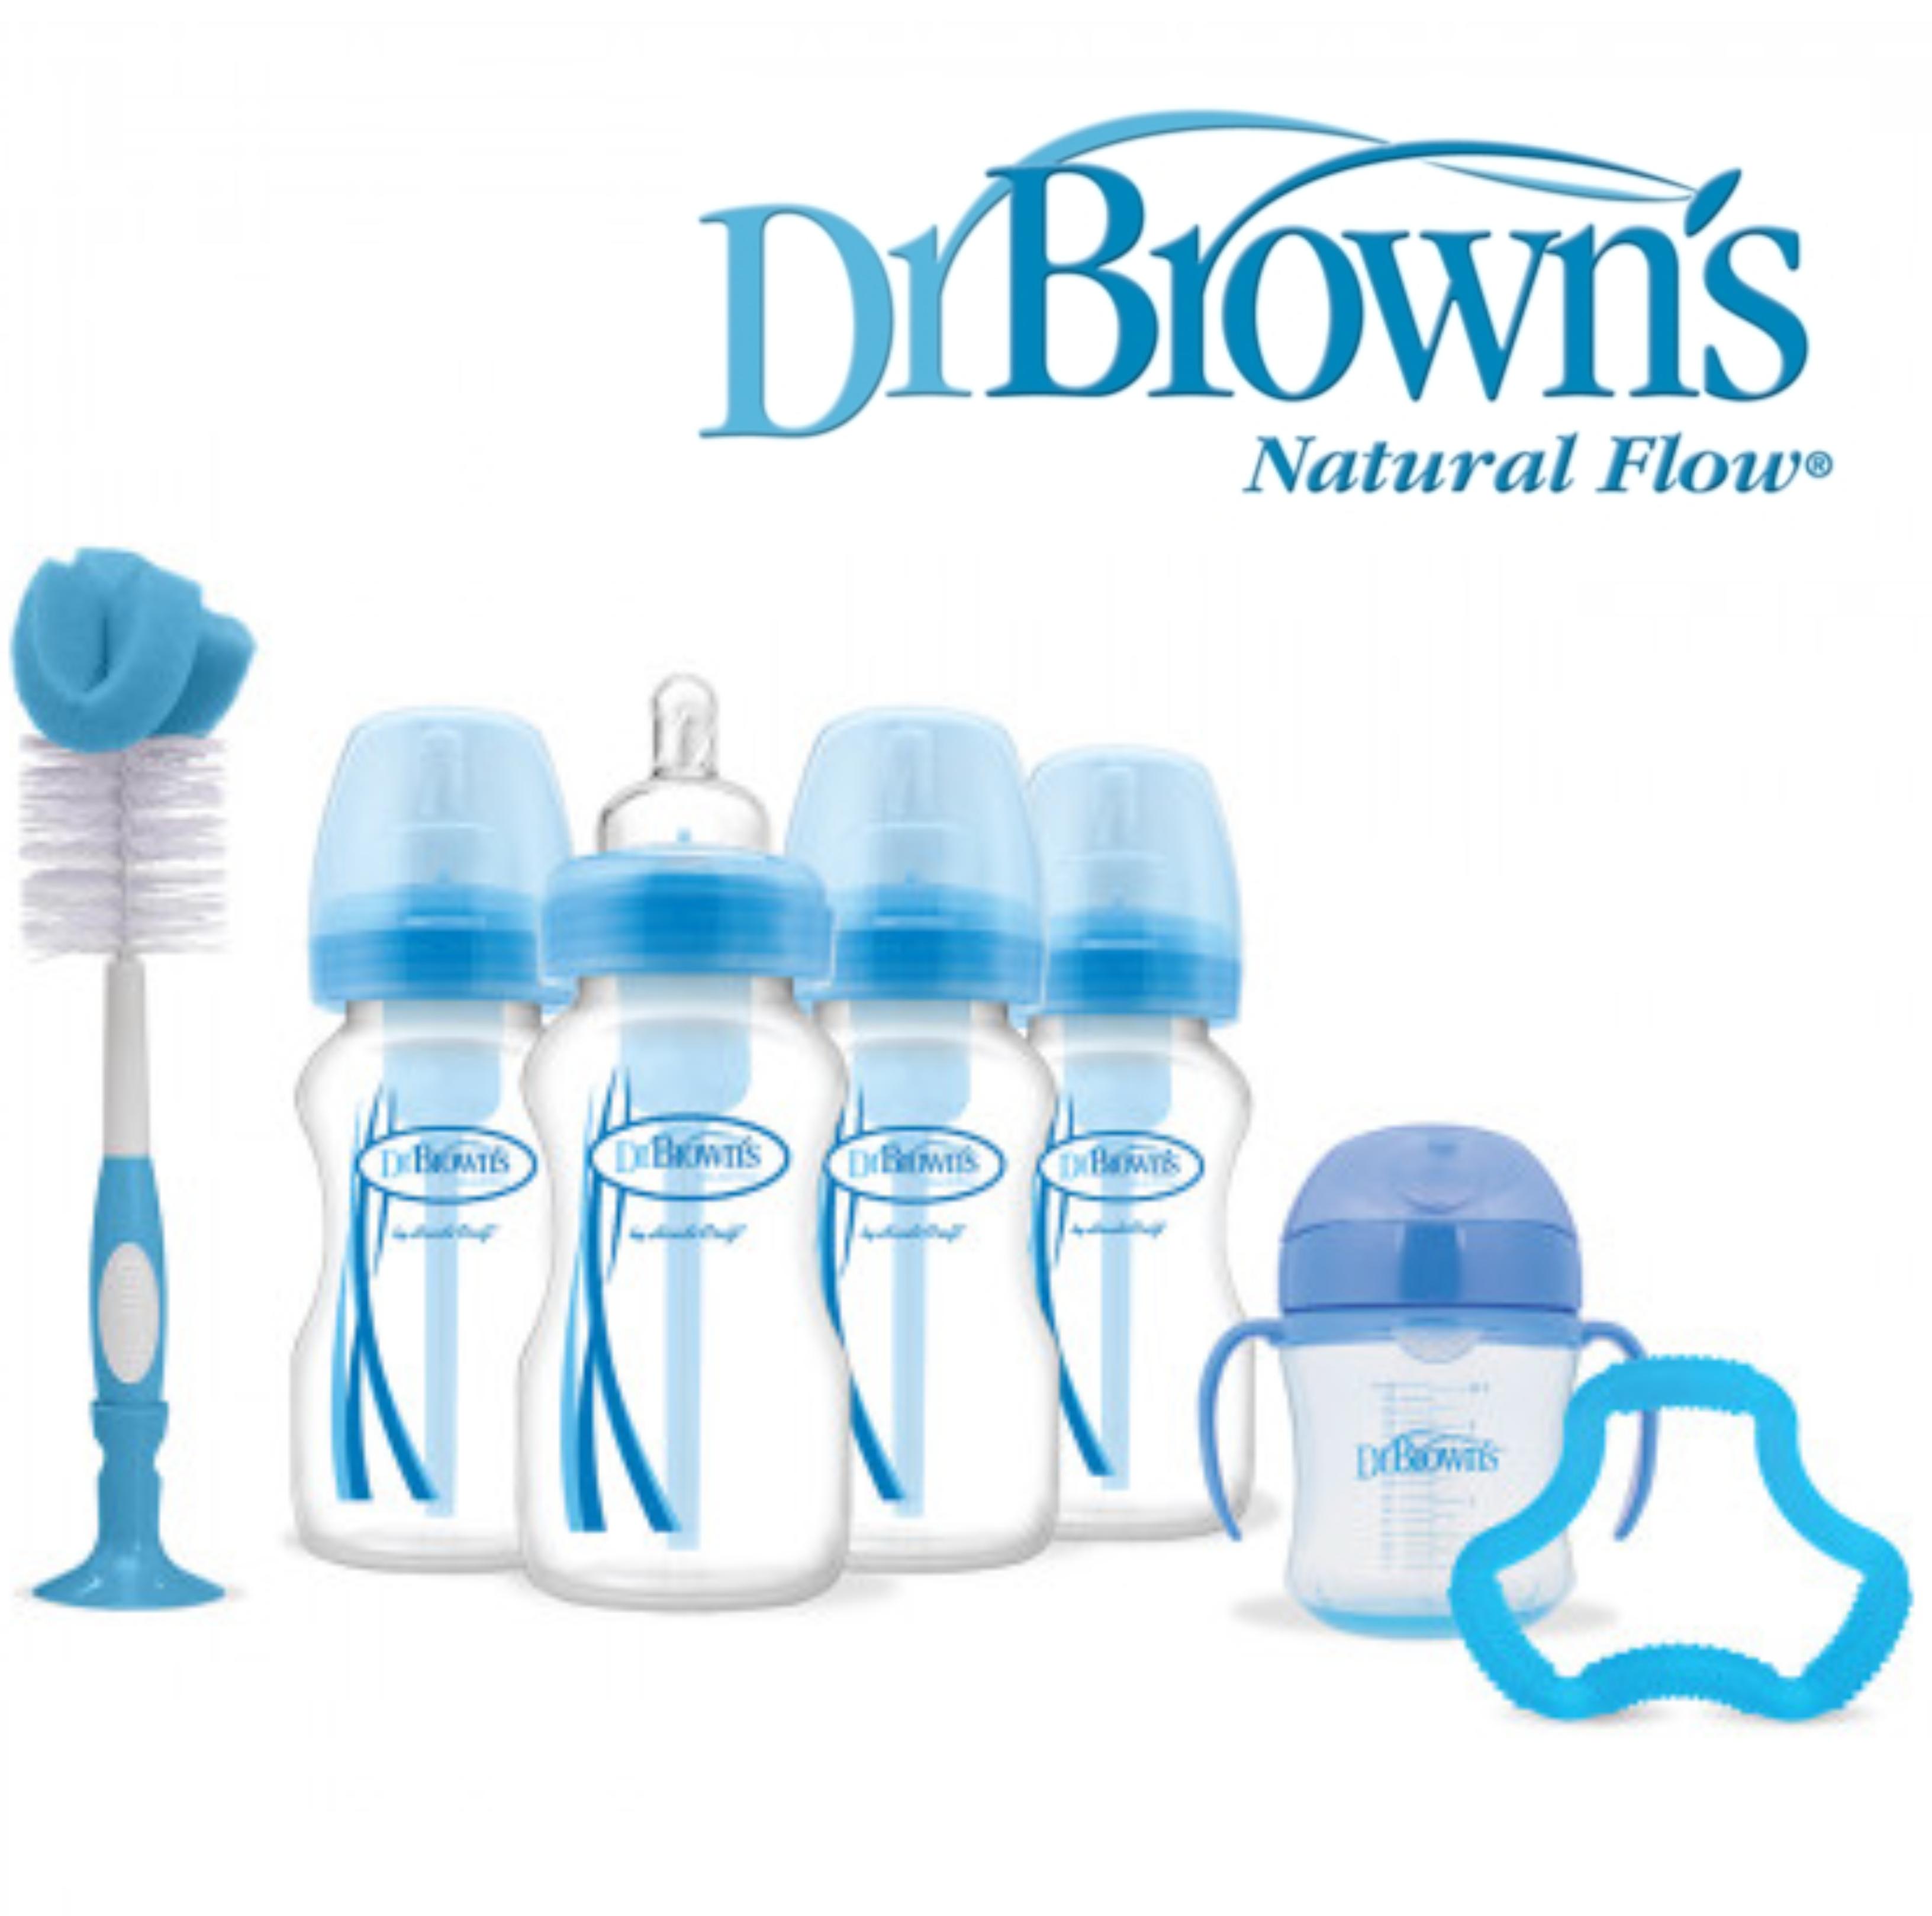 Dr Browns Baby Feeding 4 Bottle Gift Set|Wide Neck|Natural Flow Starter|BPA Free